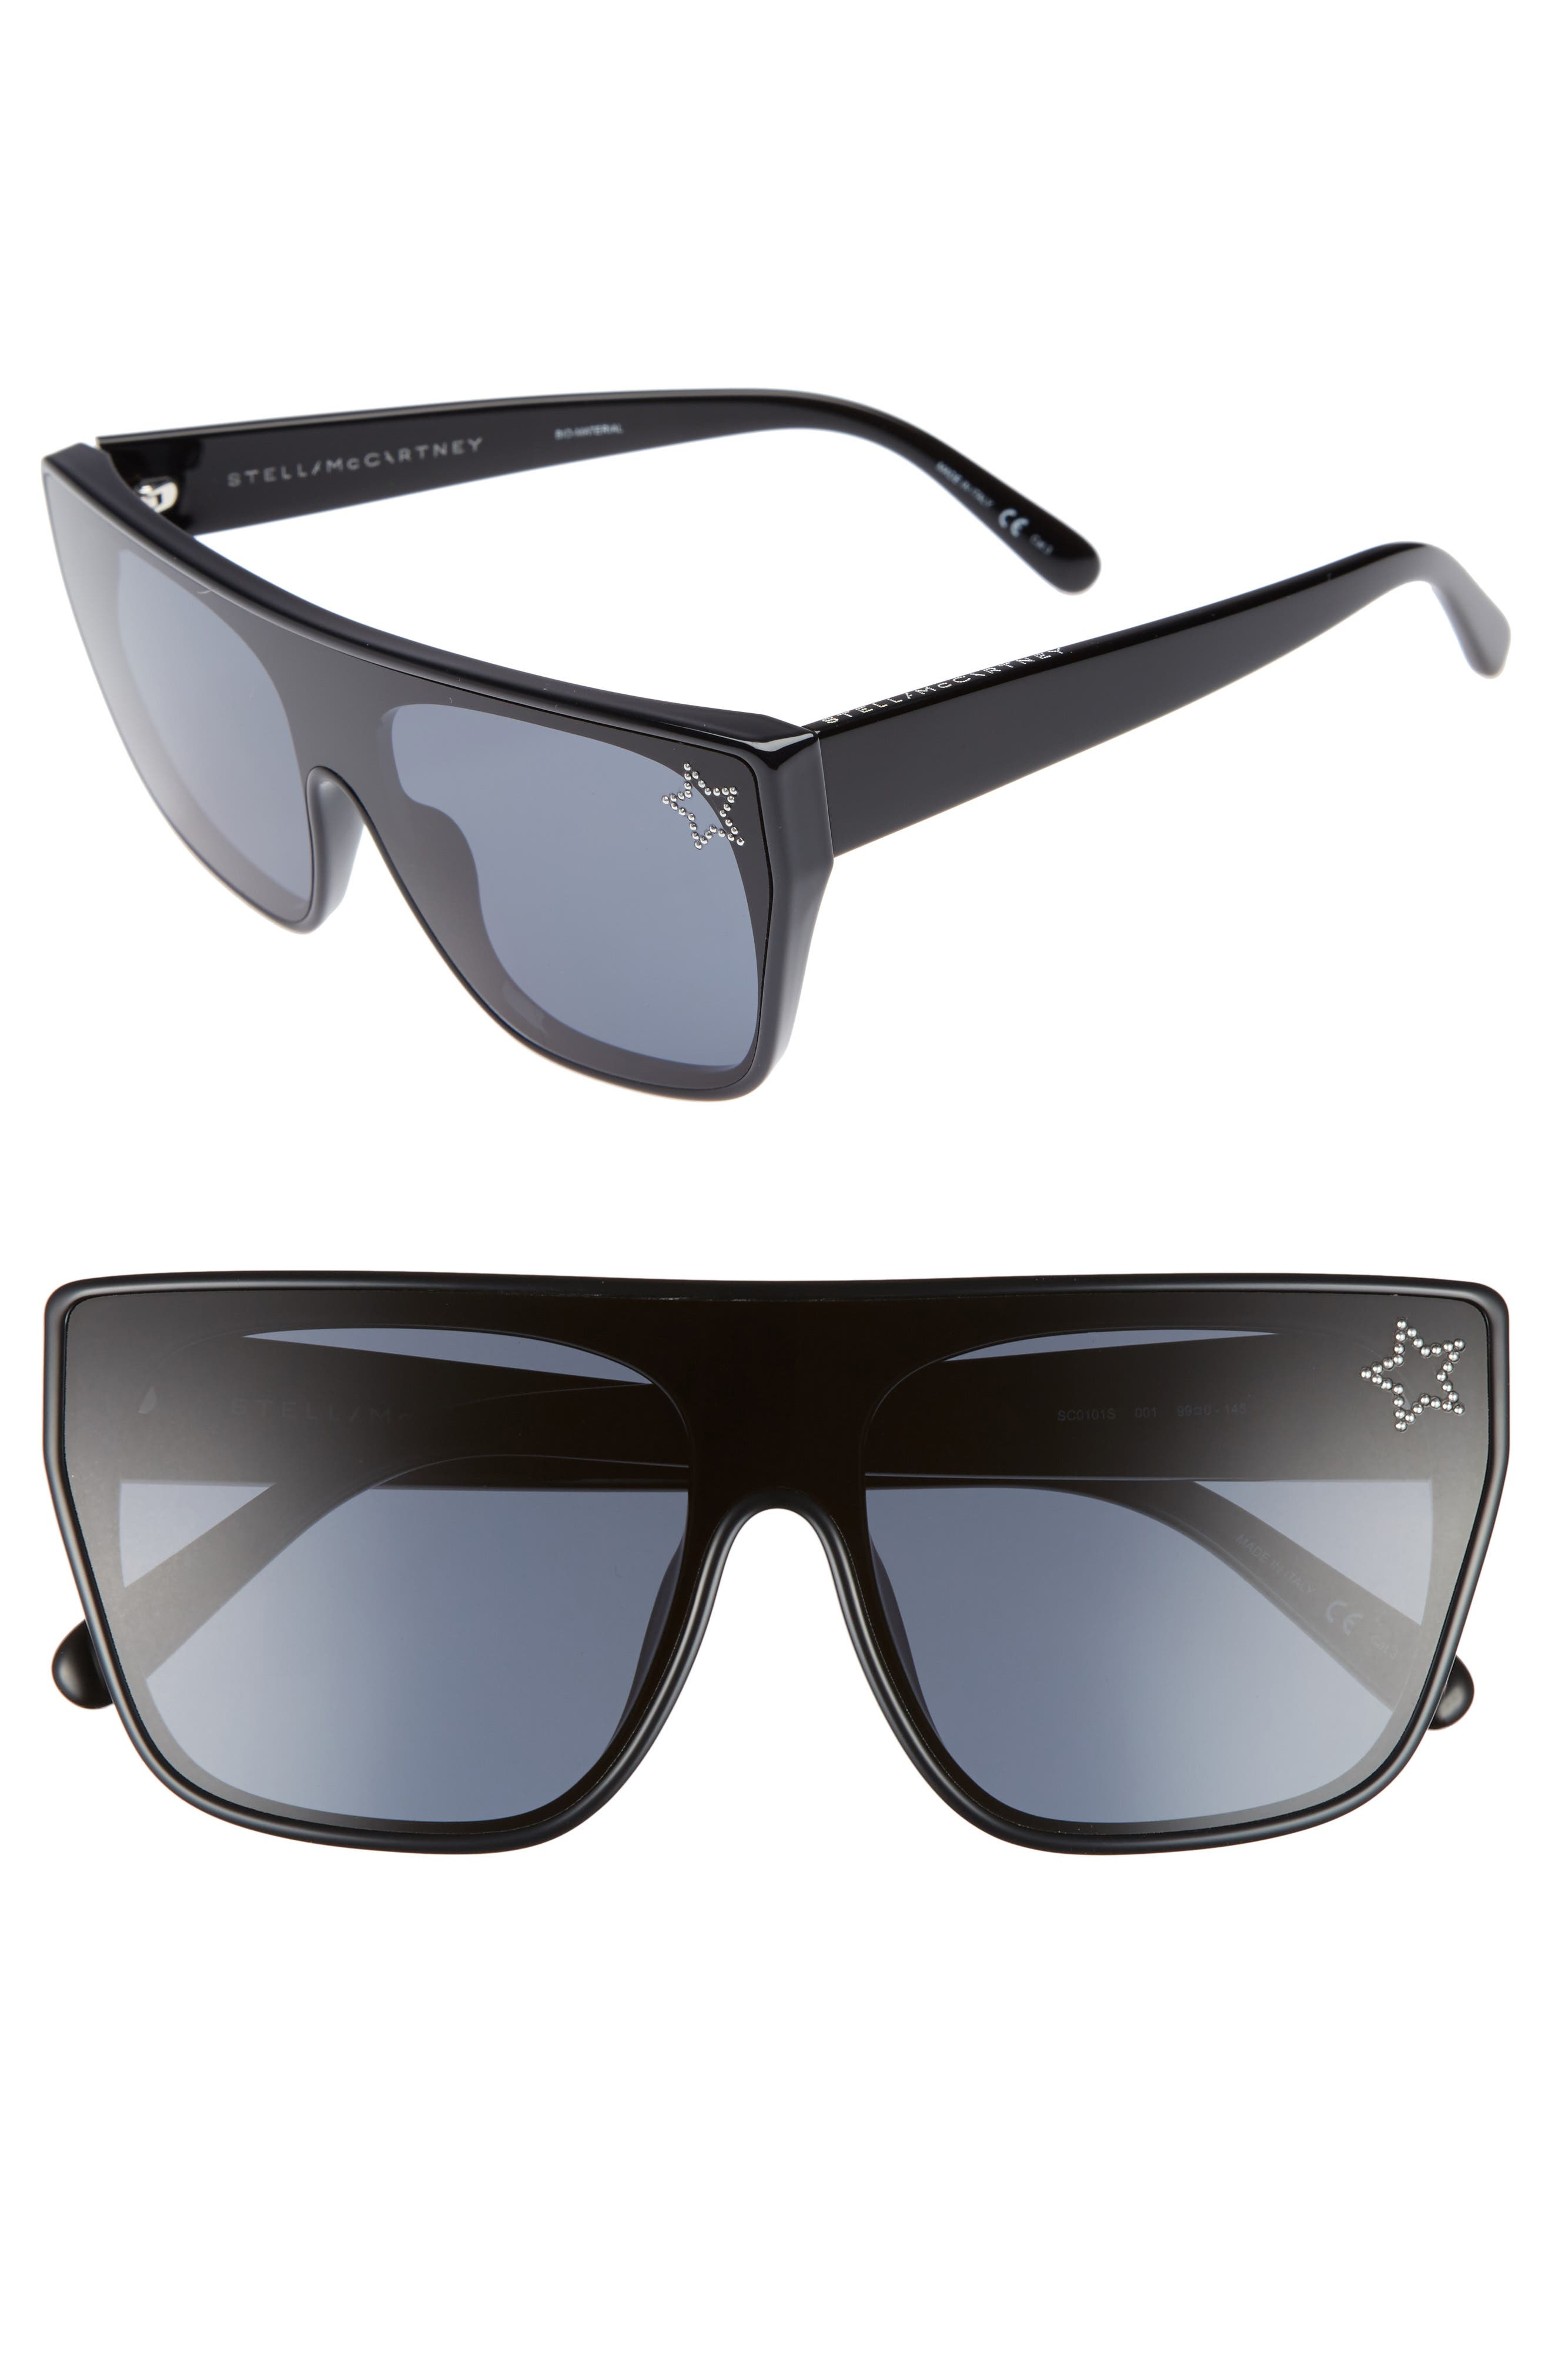 99mm Flat Top Sunglasses,                         Main,                         color, BLACK